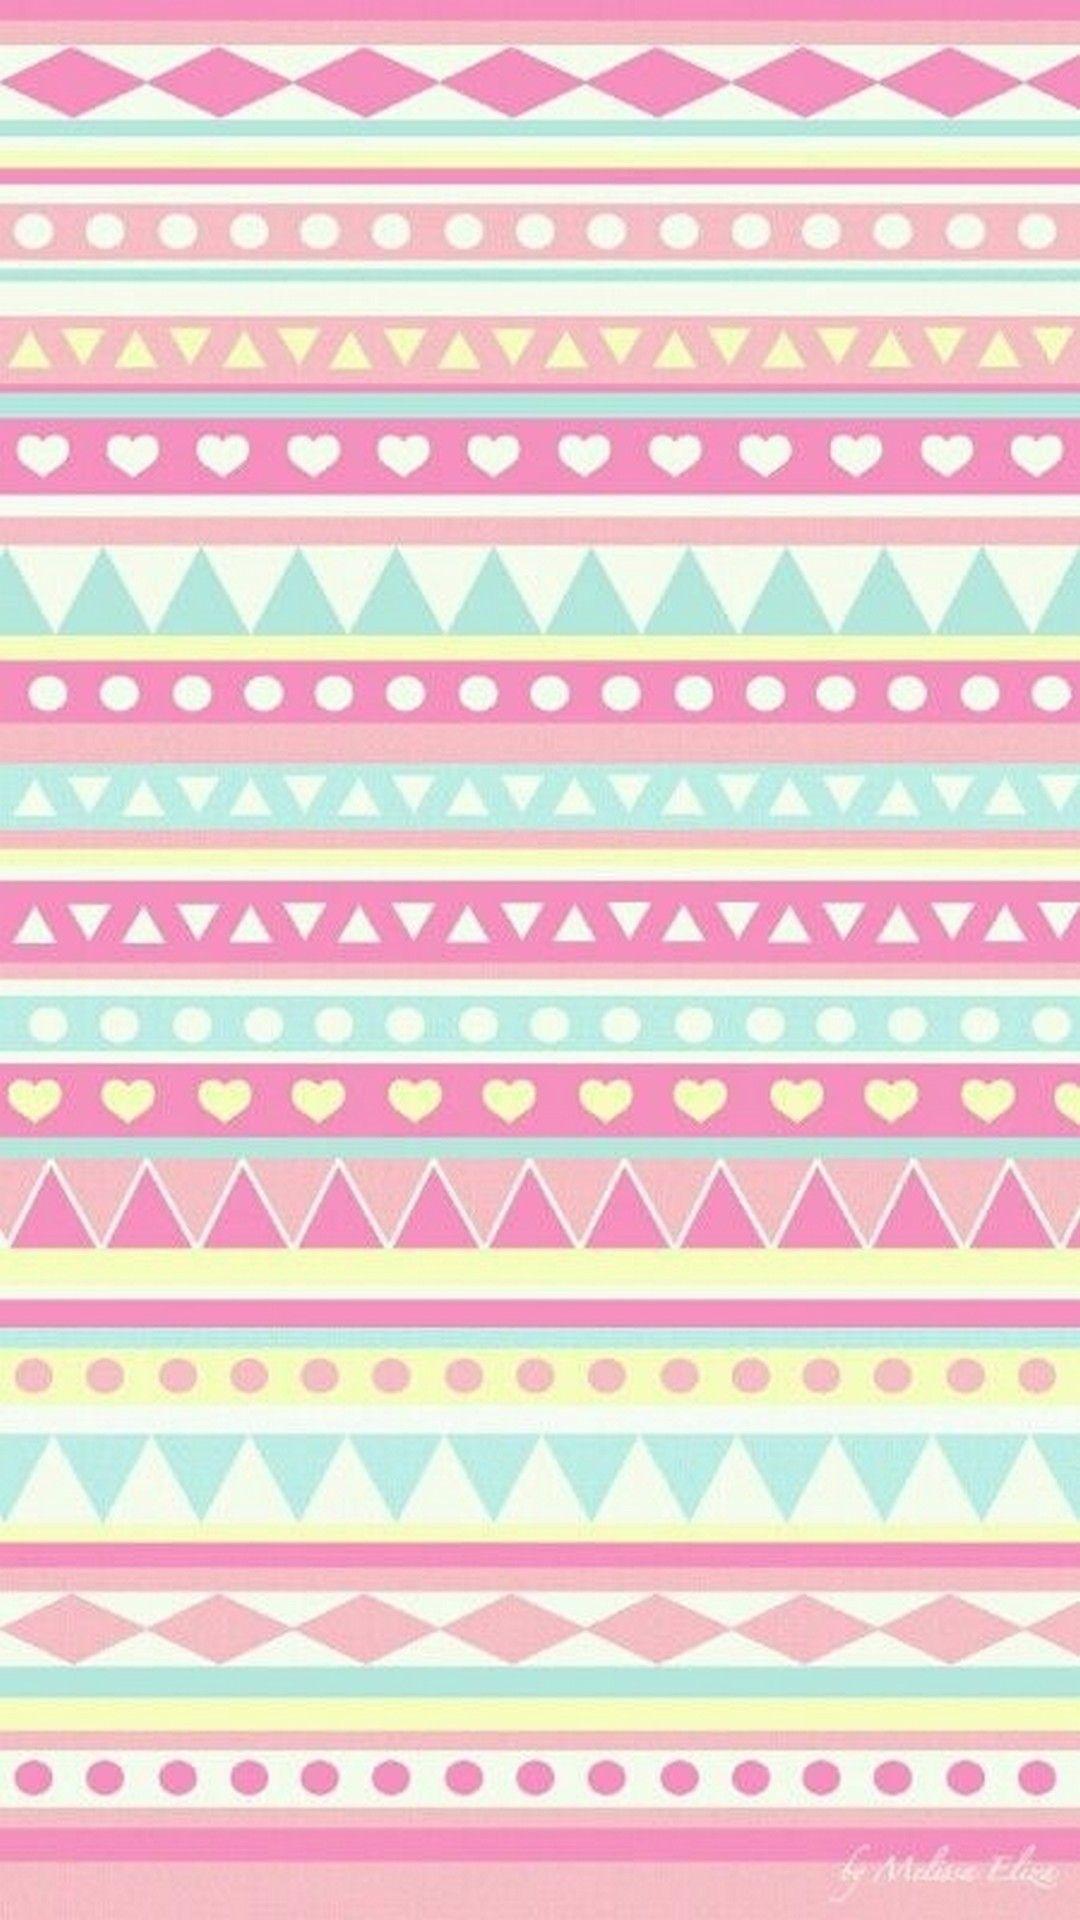 Cute Girly Iphone X Wallpaper Hd Best Phone Wallpaper Tribal